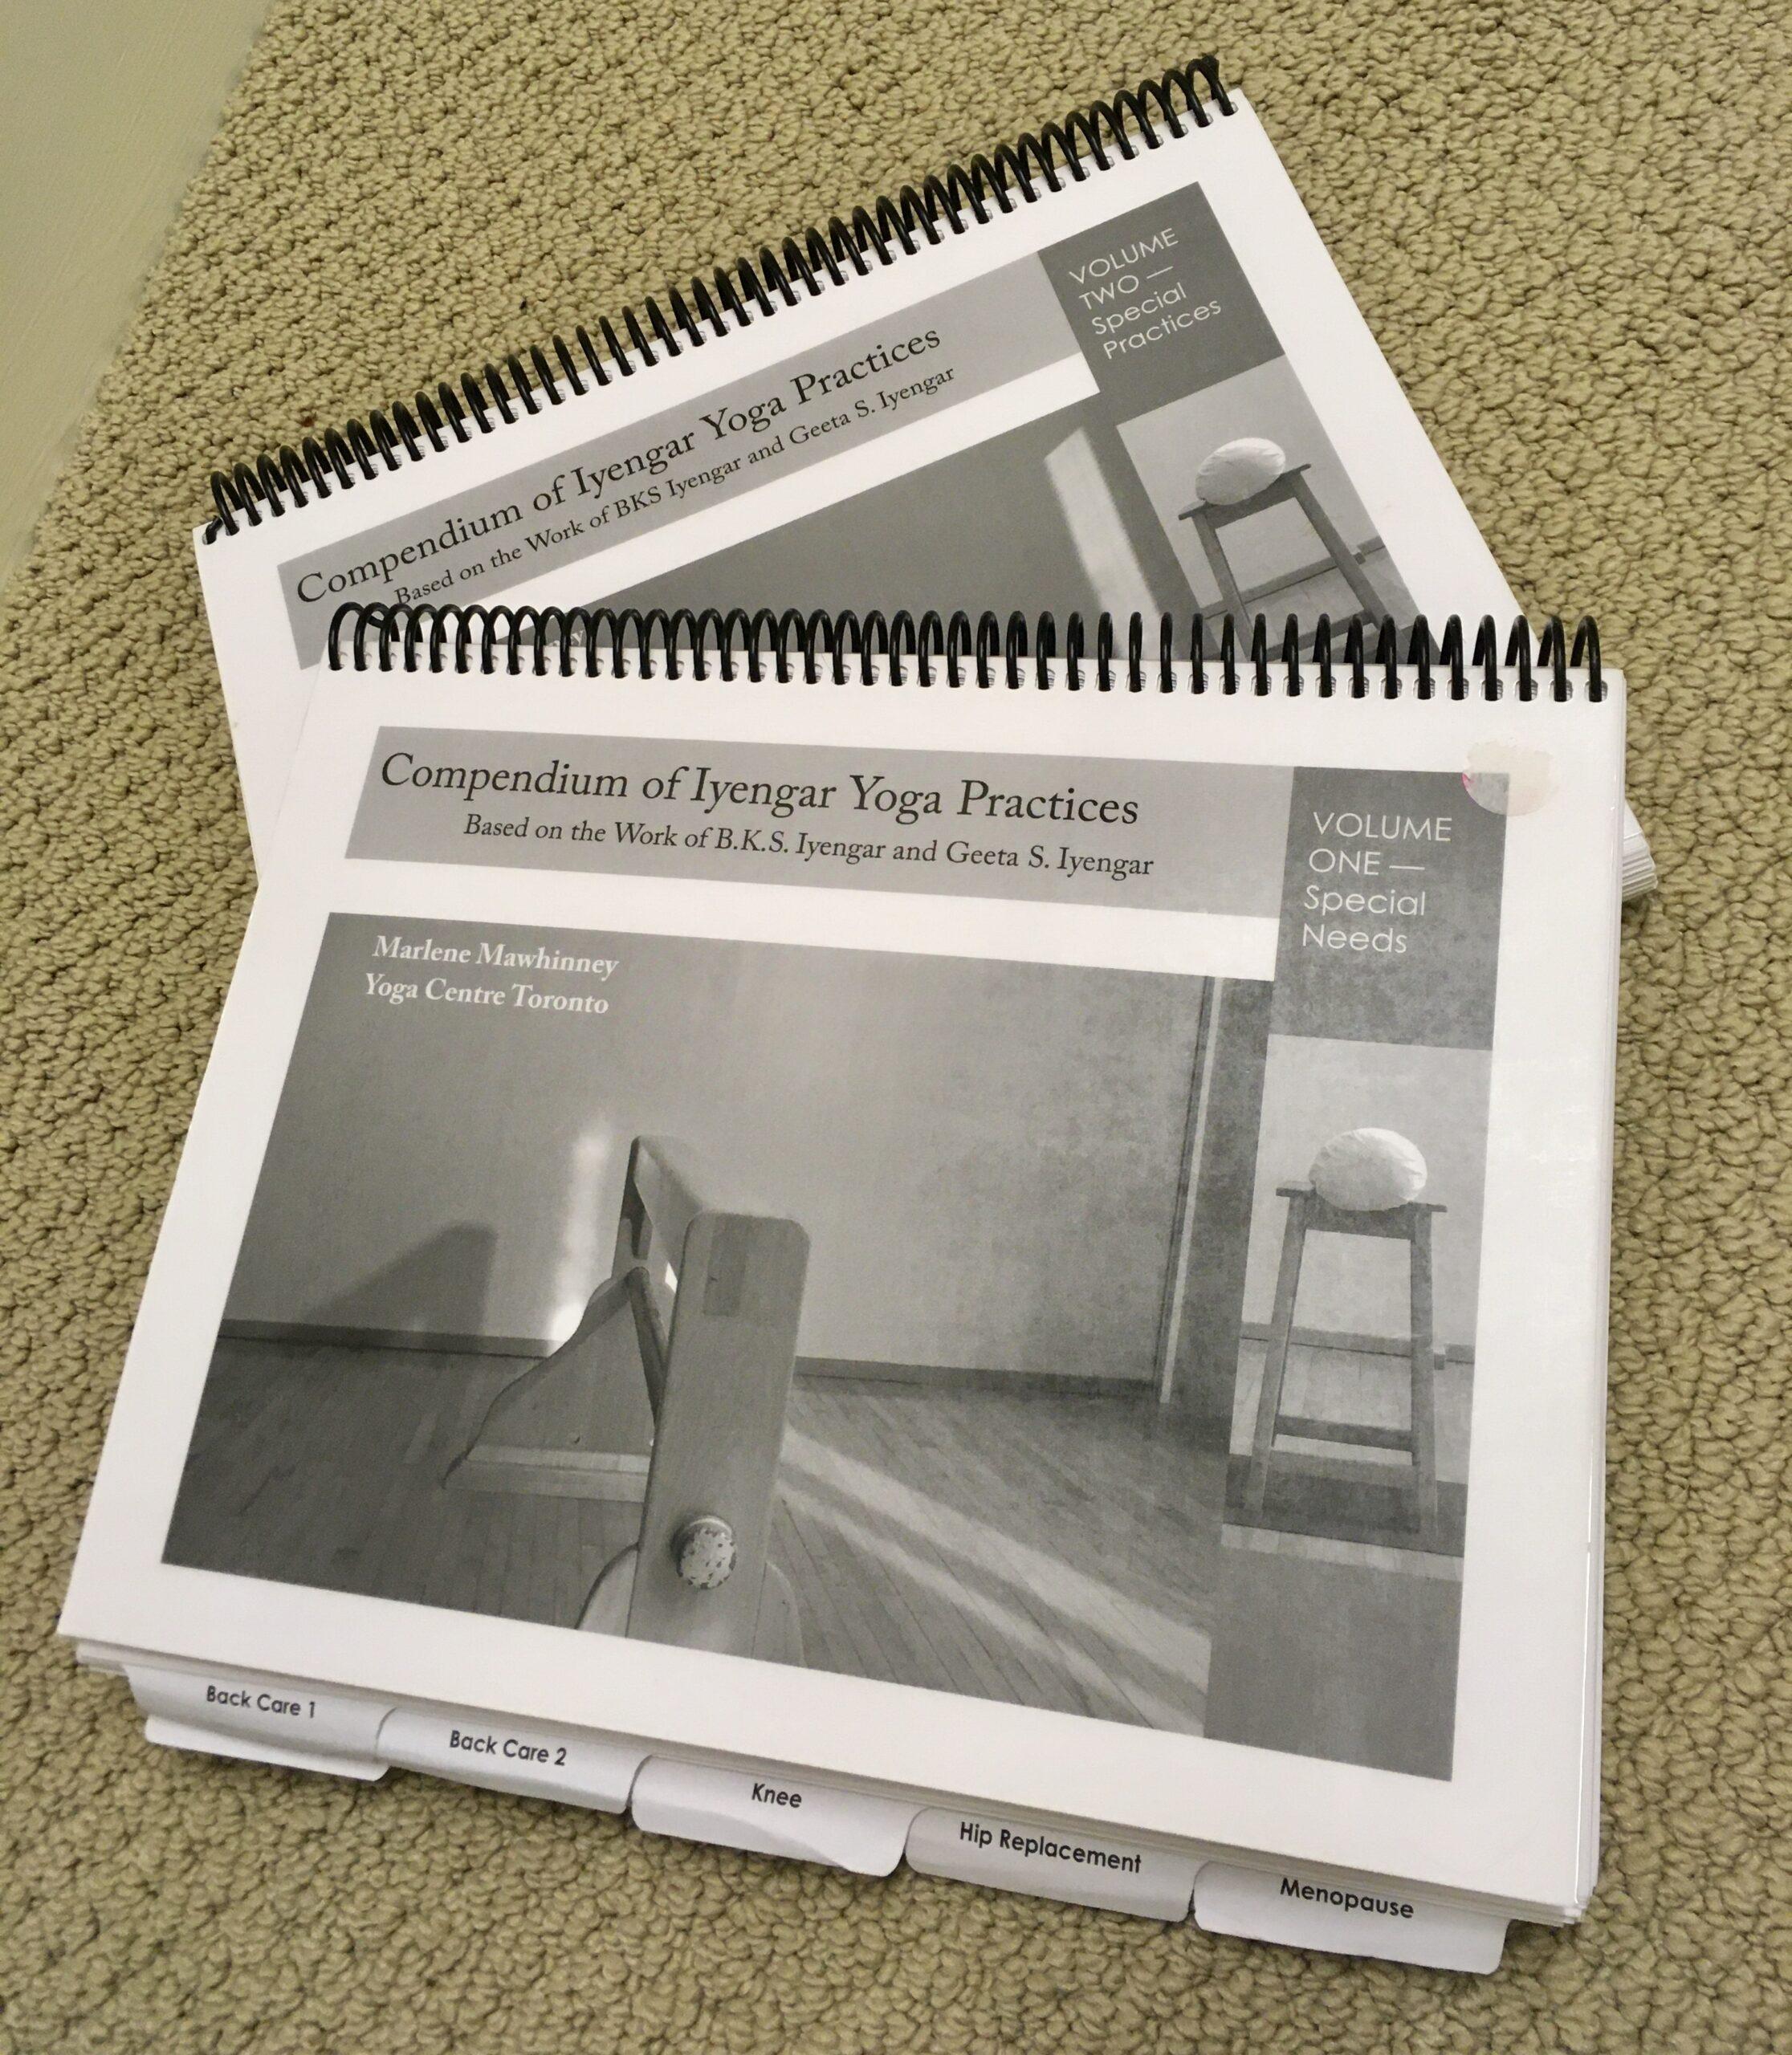 Compendium Of Iyengar Yoga Practices-2 Volume Set